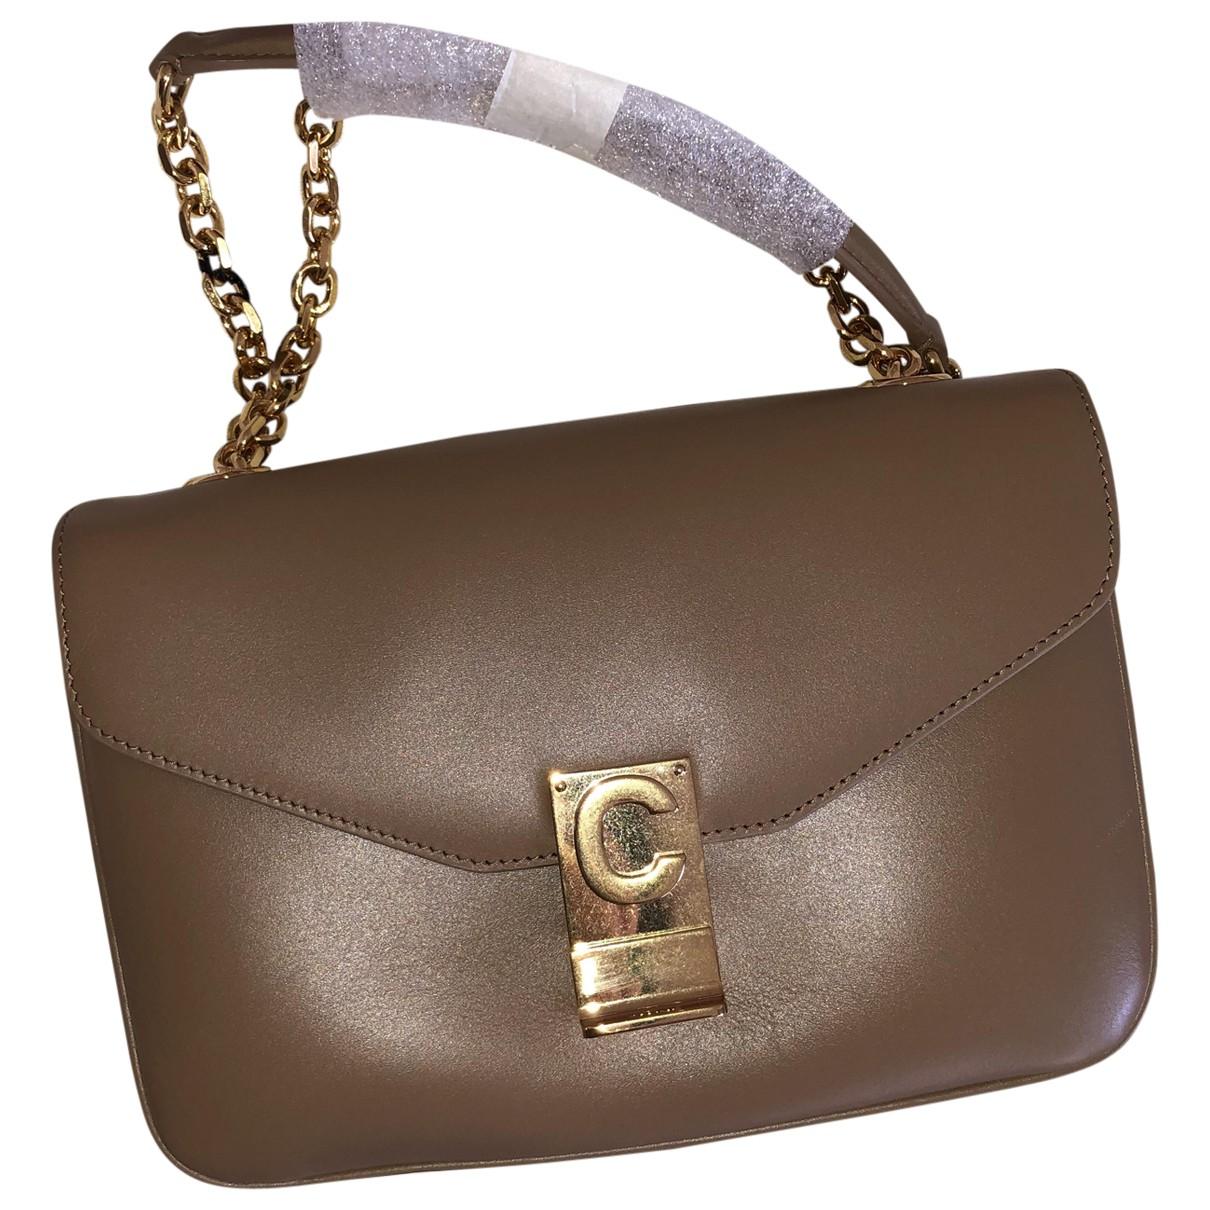 Celine C bag Beige Leather handbag for Women \N